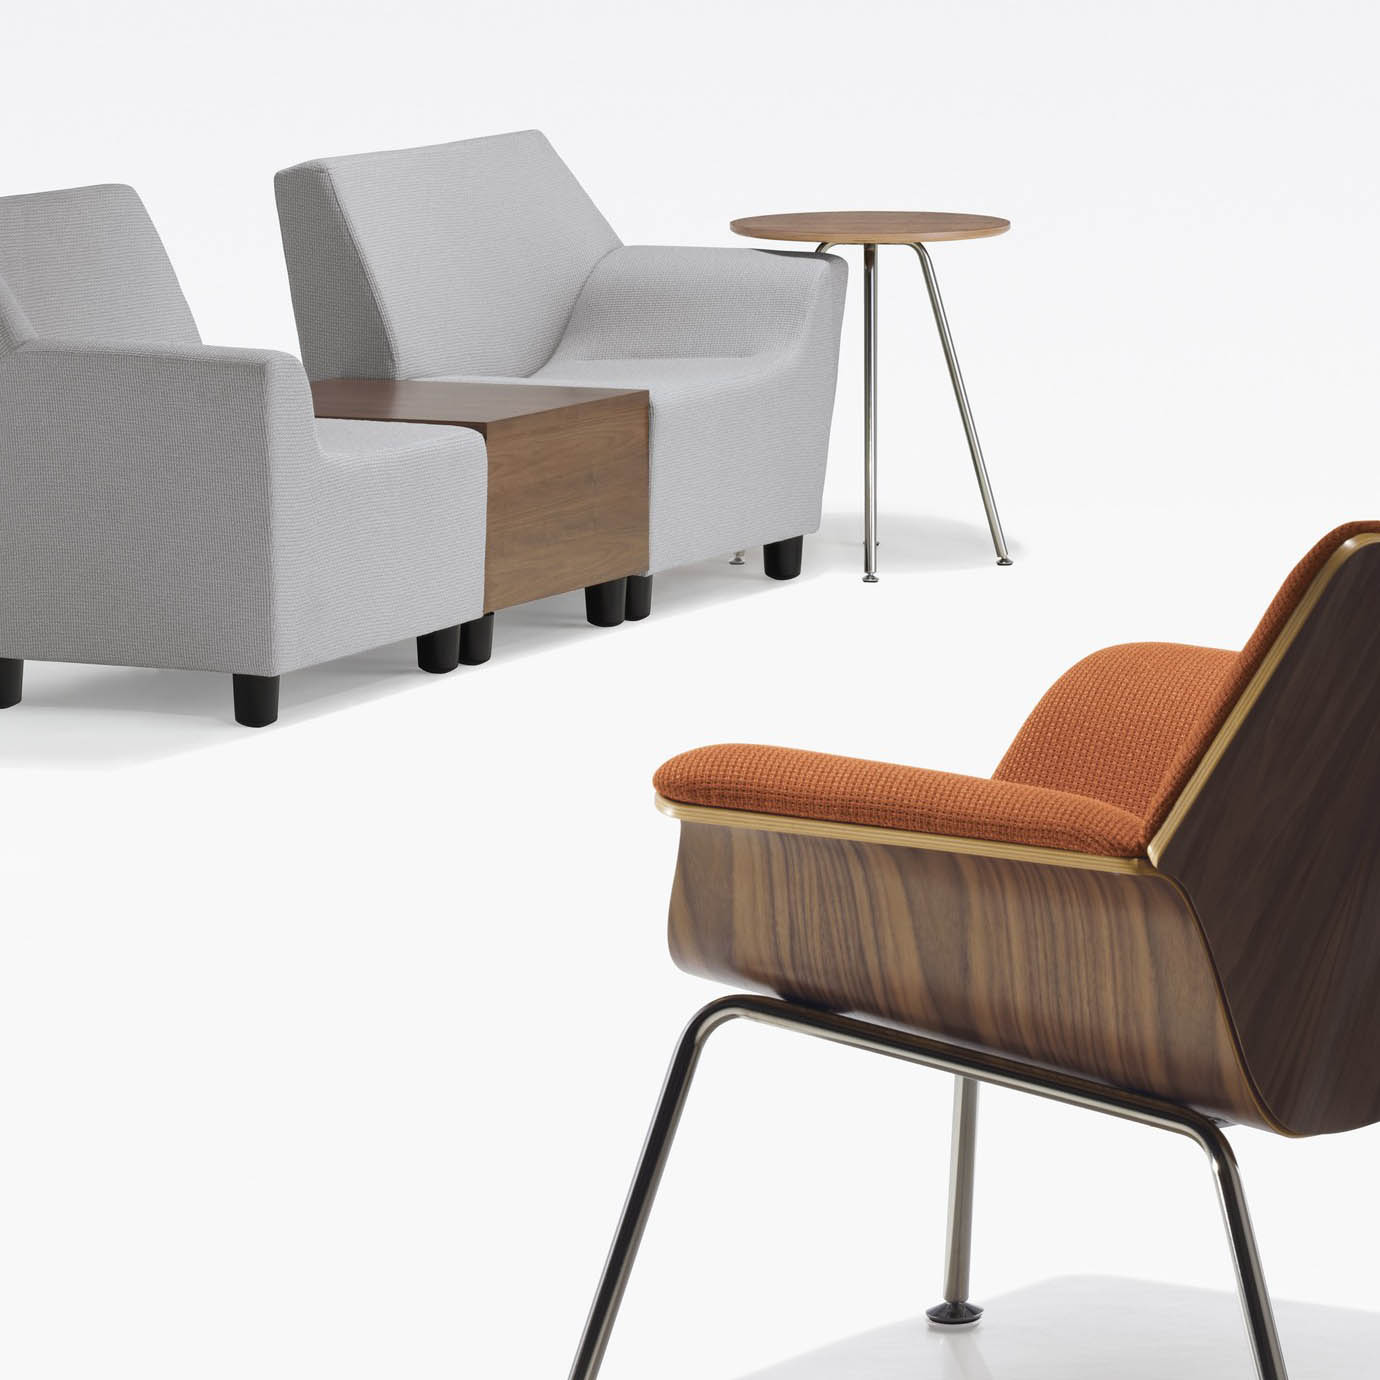 2-Silla-Lounge-Swoop-2-1380